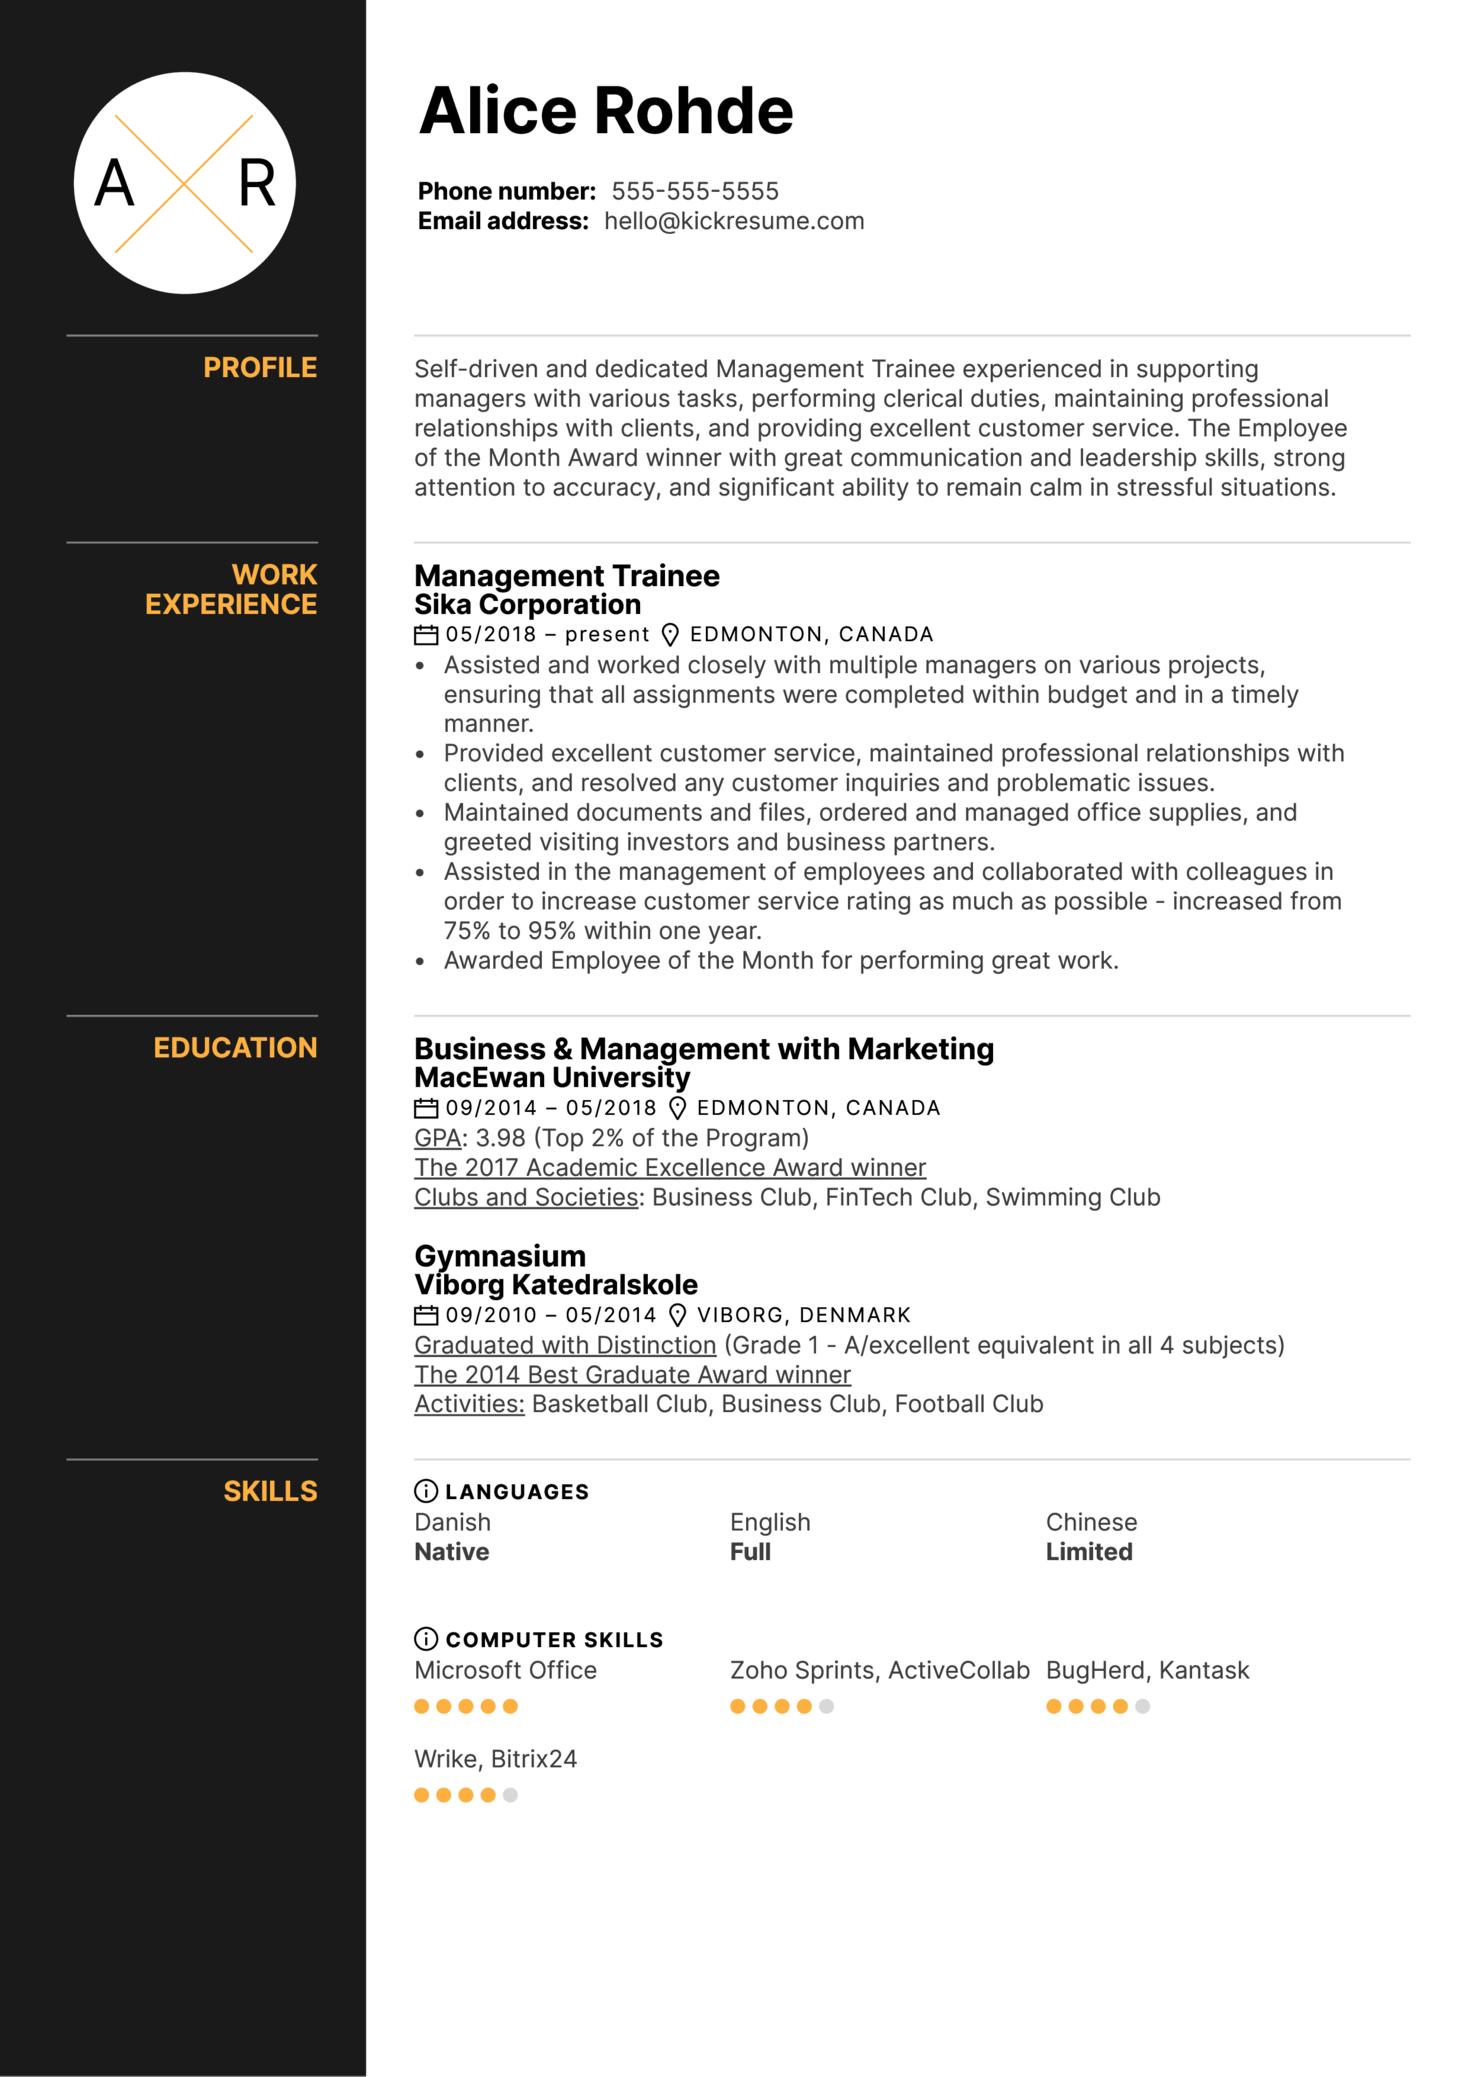 Management Trainee Resume Example (časť 1)